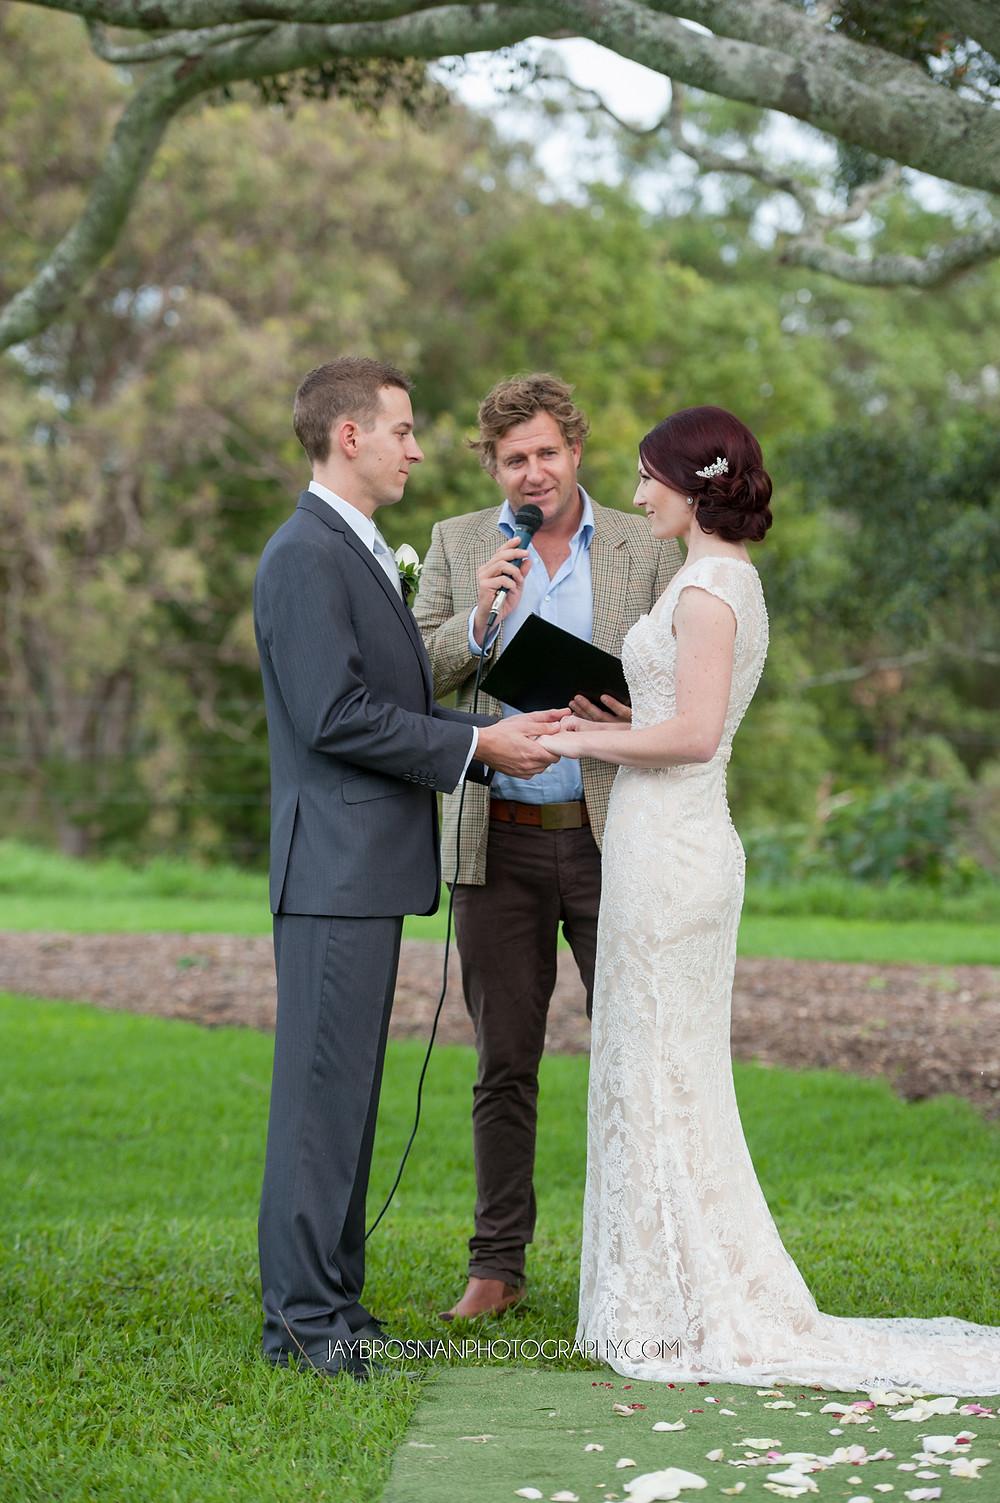 Jay Brosnan Photography | Yandina Station | Yandina Station wedding | Sunshine Coast Wedding Photographer | Brisbane Wedding Photographer | Sunshine Coast Wedding Venue | Brisbane Wedding Venue